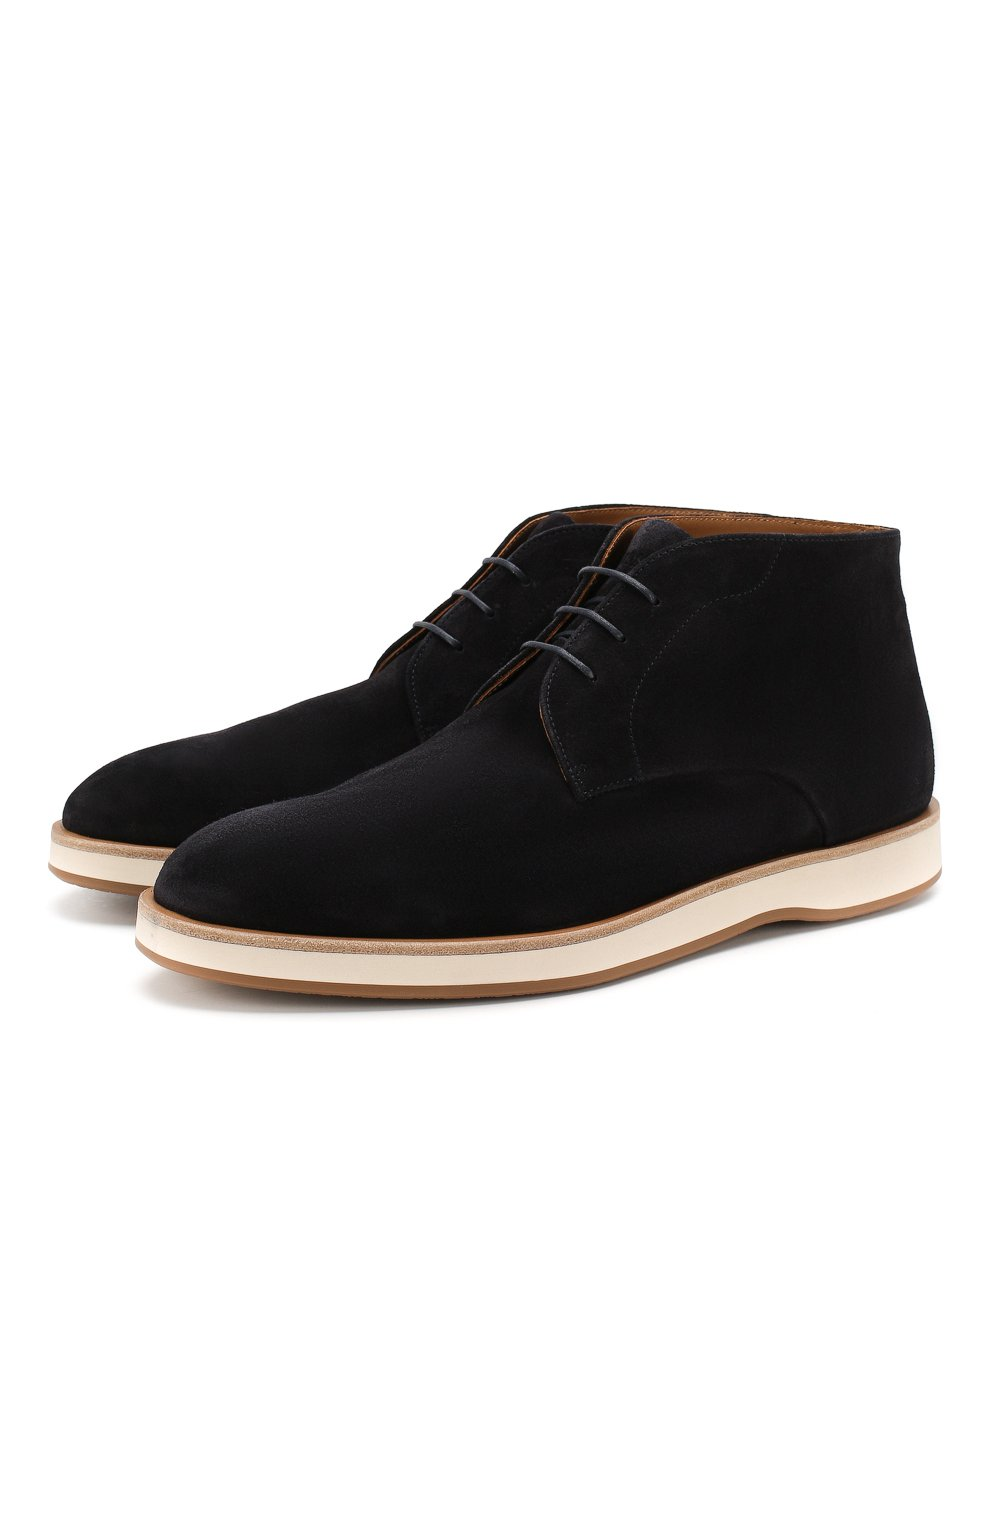 Мужские замшевые ботинки BOSS синего цвета, арт. 50407945 | Фото 1